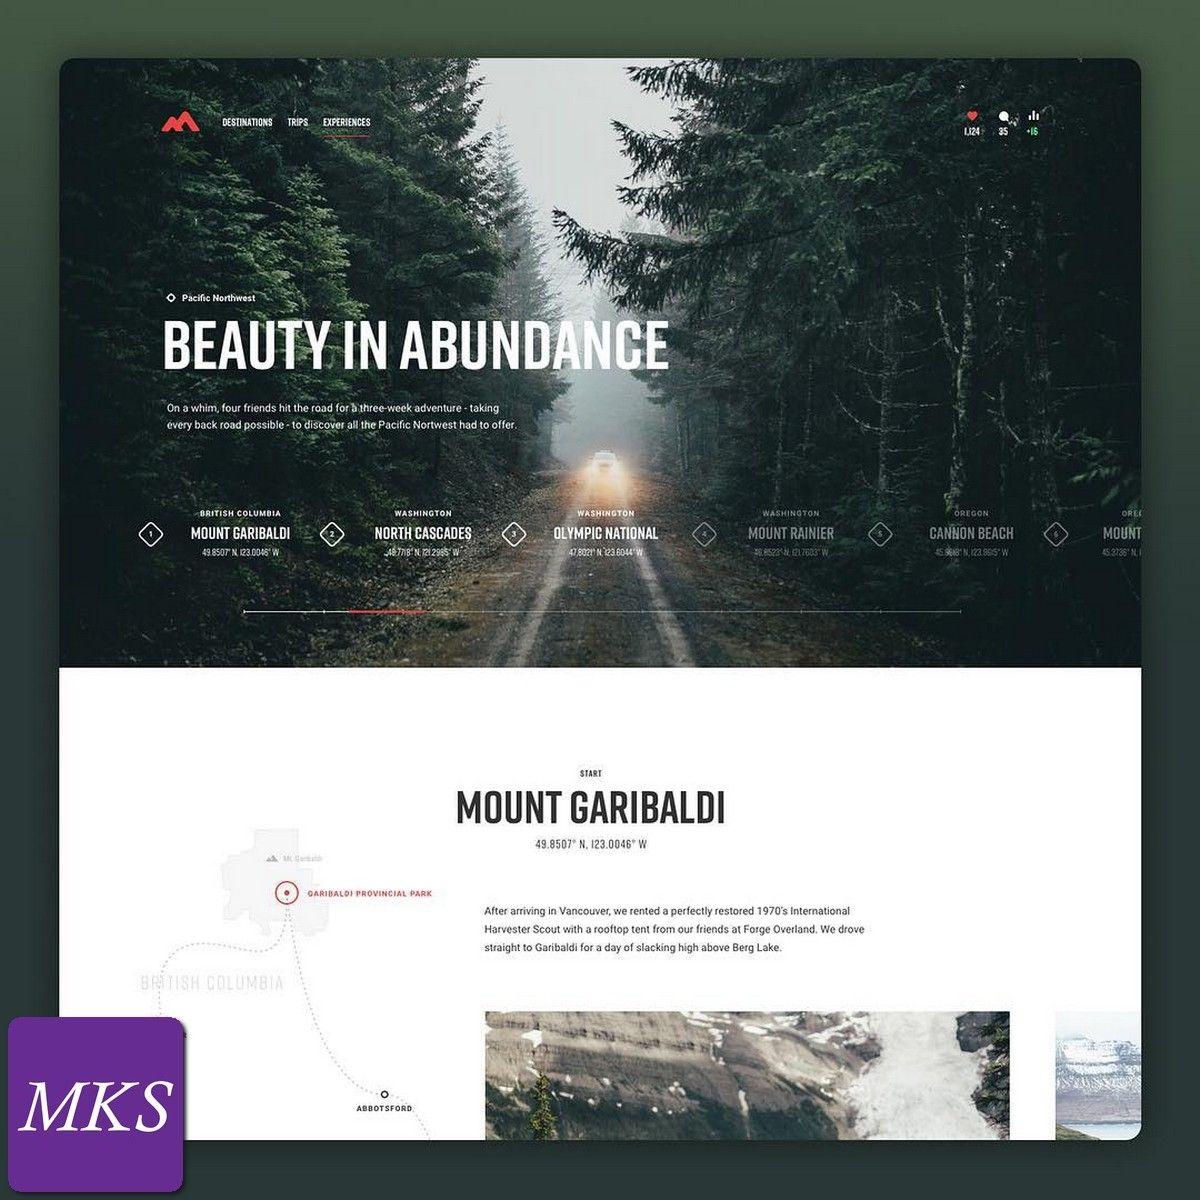 Web Design Mkswd Wordpress Mks Webdesign Websitedesign Mhk Ks With Images Custom Web Design Web Design Quotes Web Design Inspiration